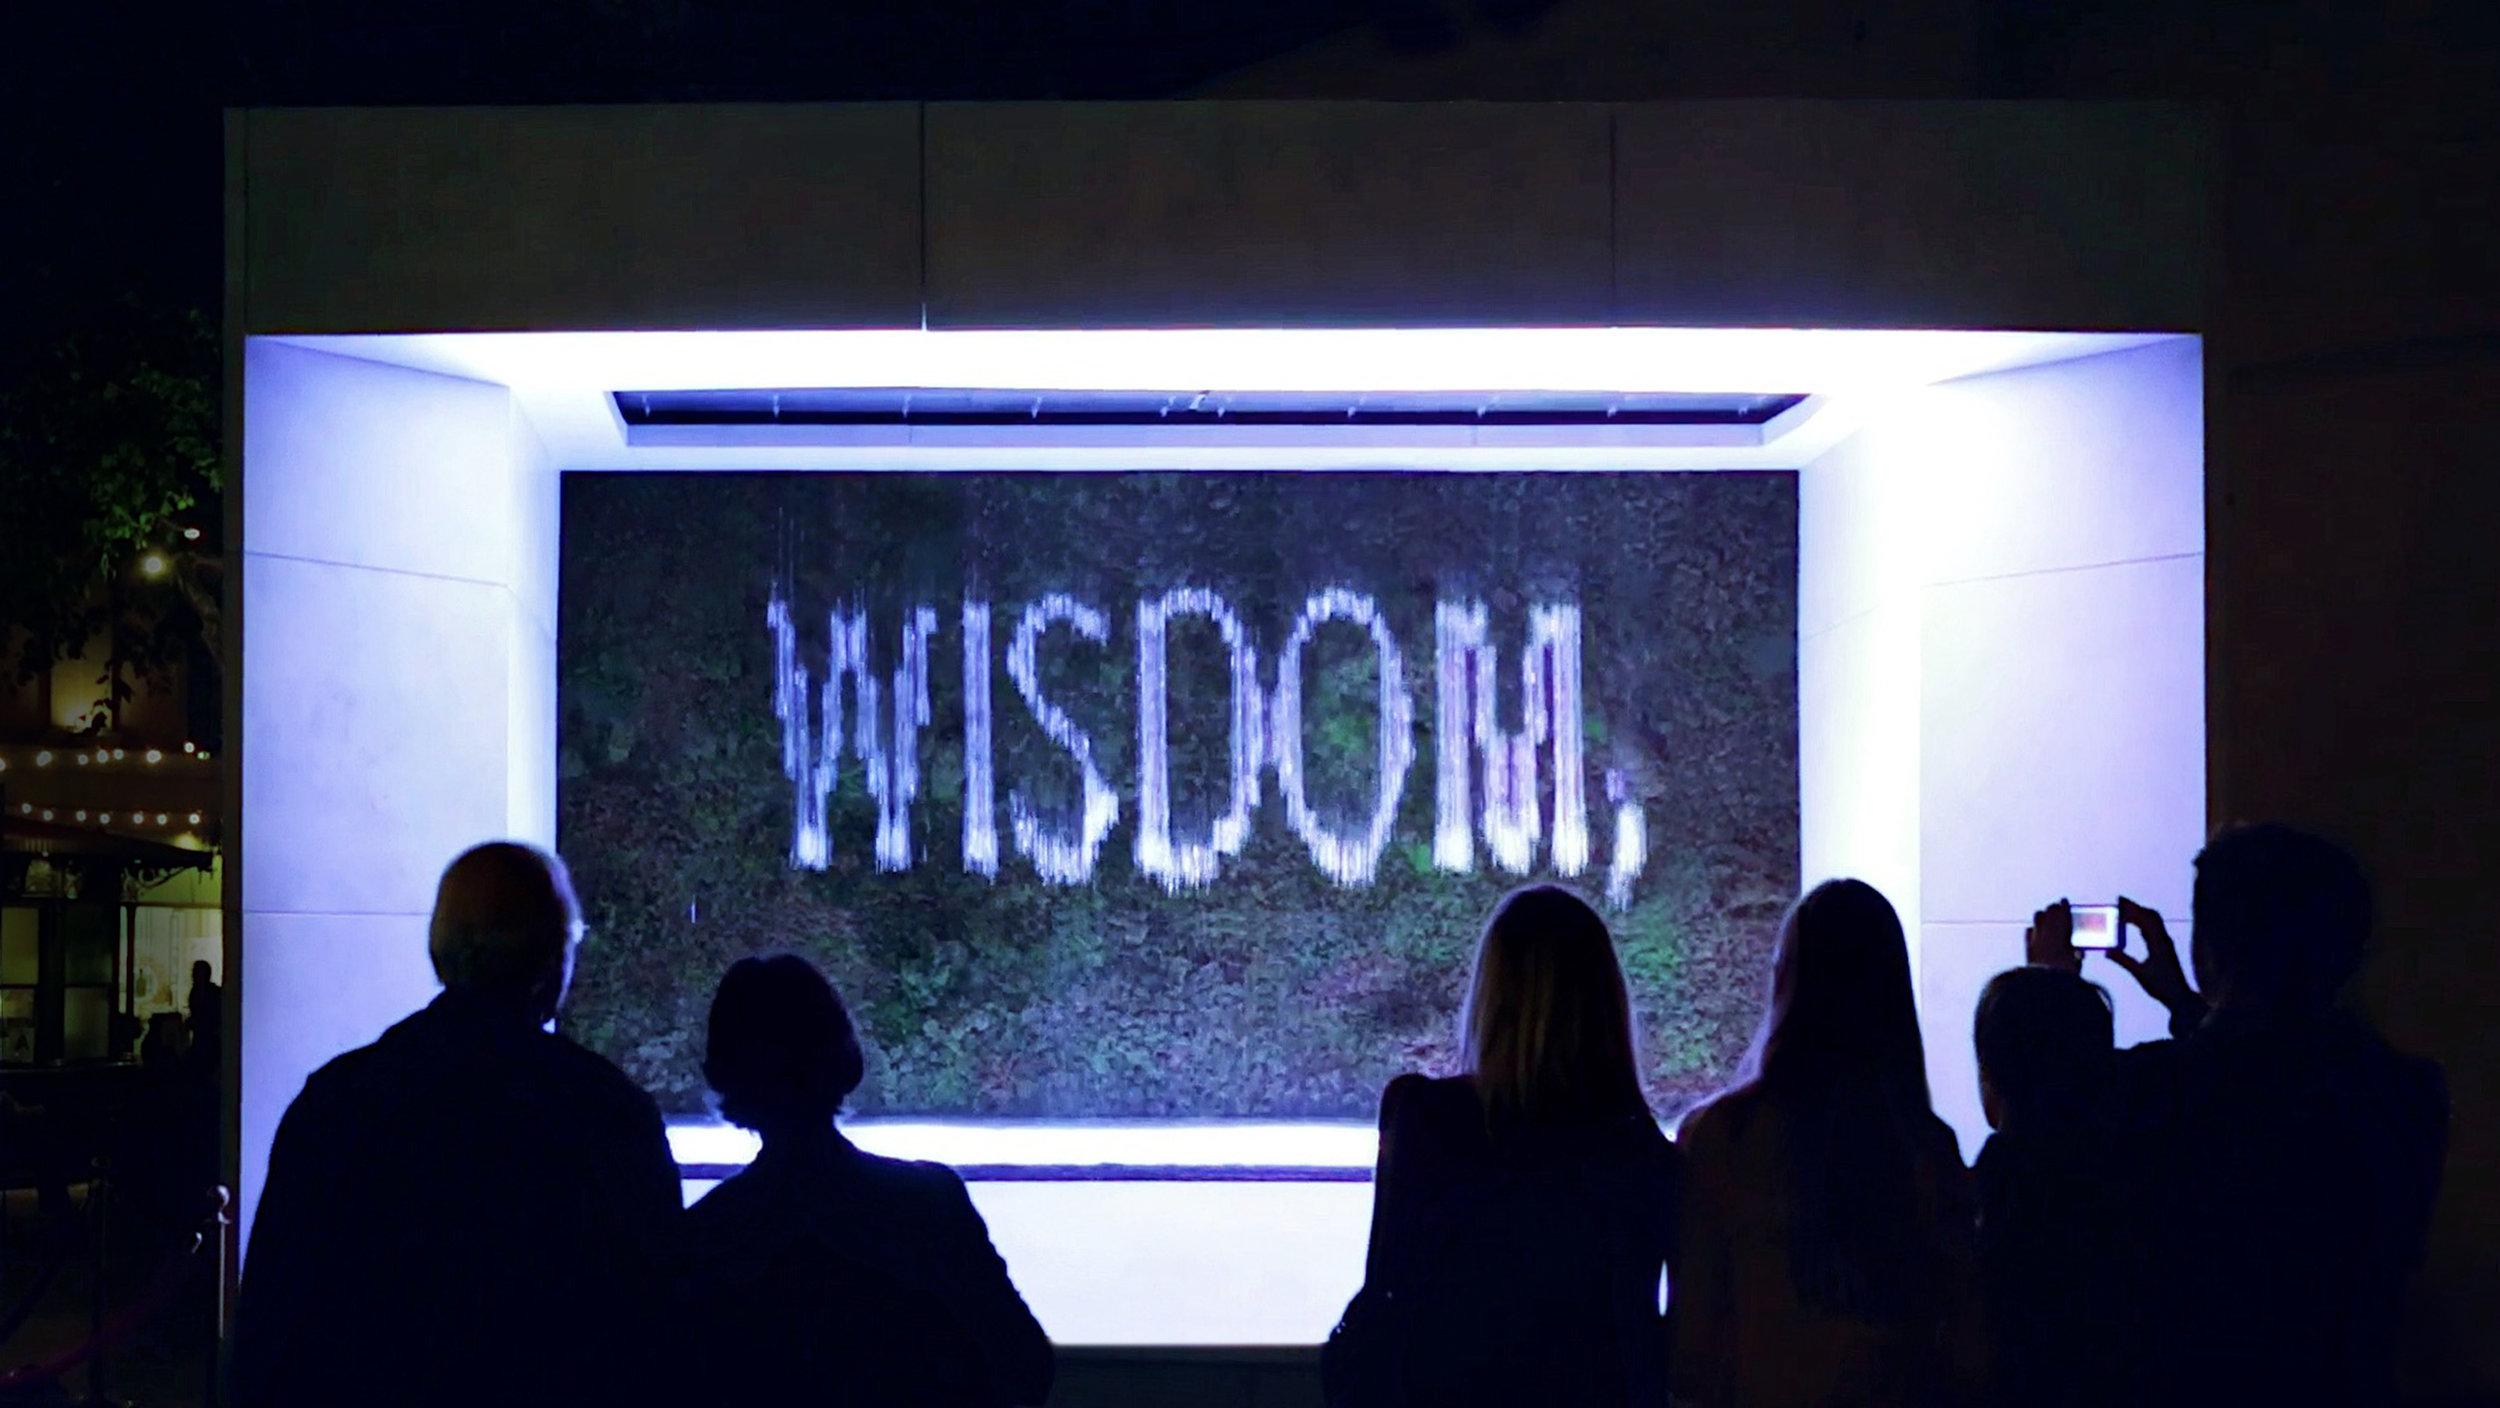 WISDOM_ADJ_2.jpg